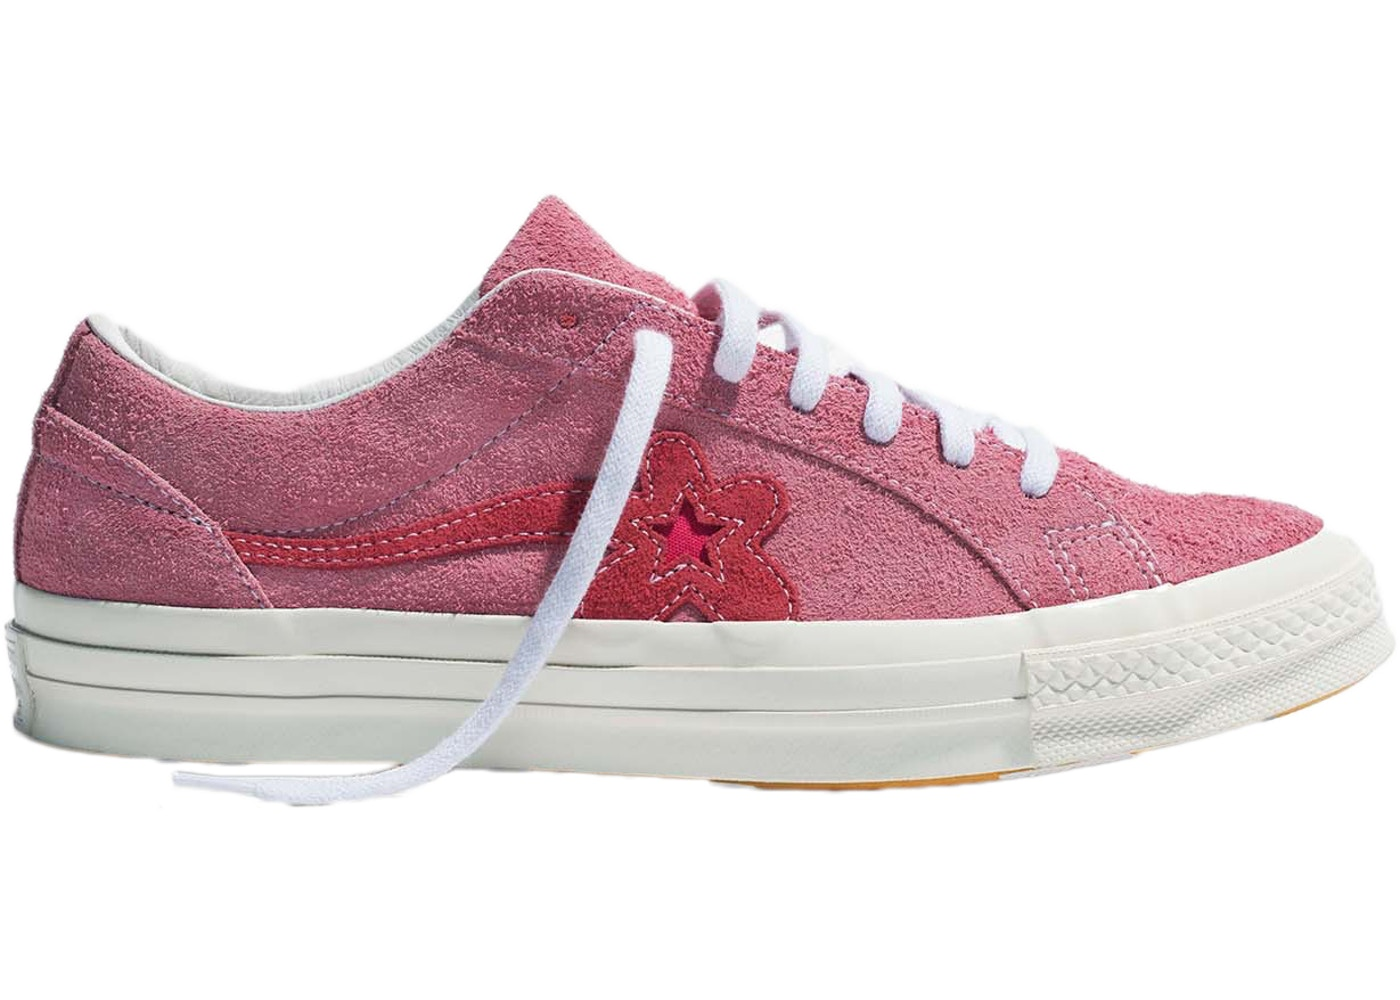 f9c9b73235a Converse One Star Ox Tyler the Creator Golf Le Fleur Geranium Pink - 160325C